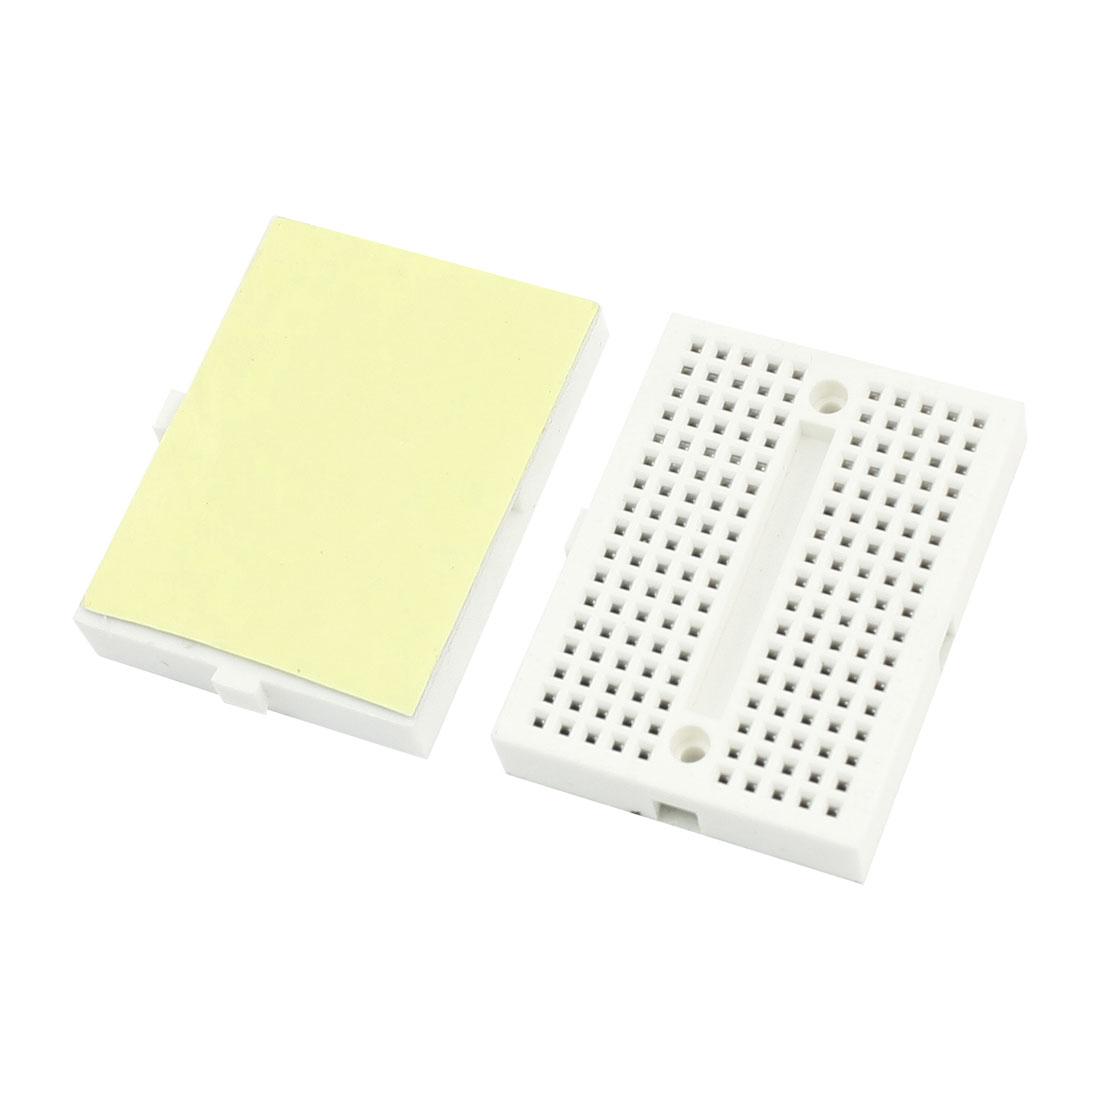 2pcs White Universal 170 Tiepoint Electronic DIY Solderless Breadboard SYB-170